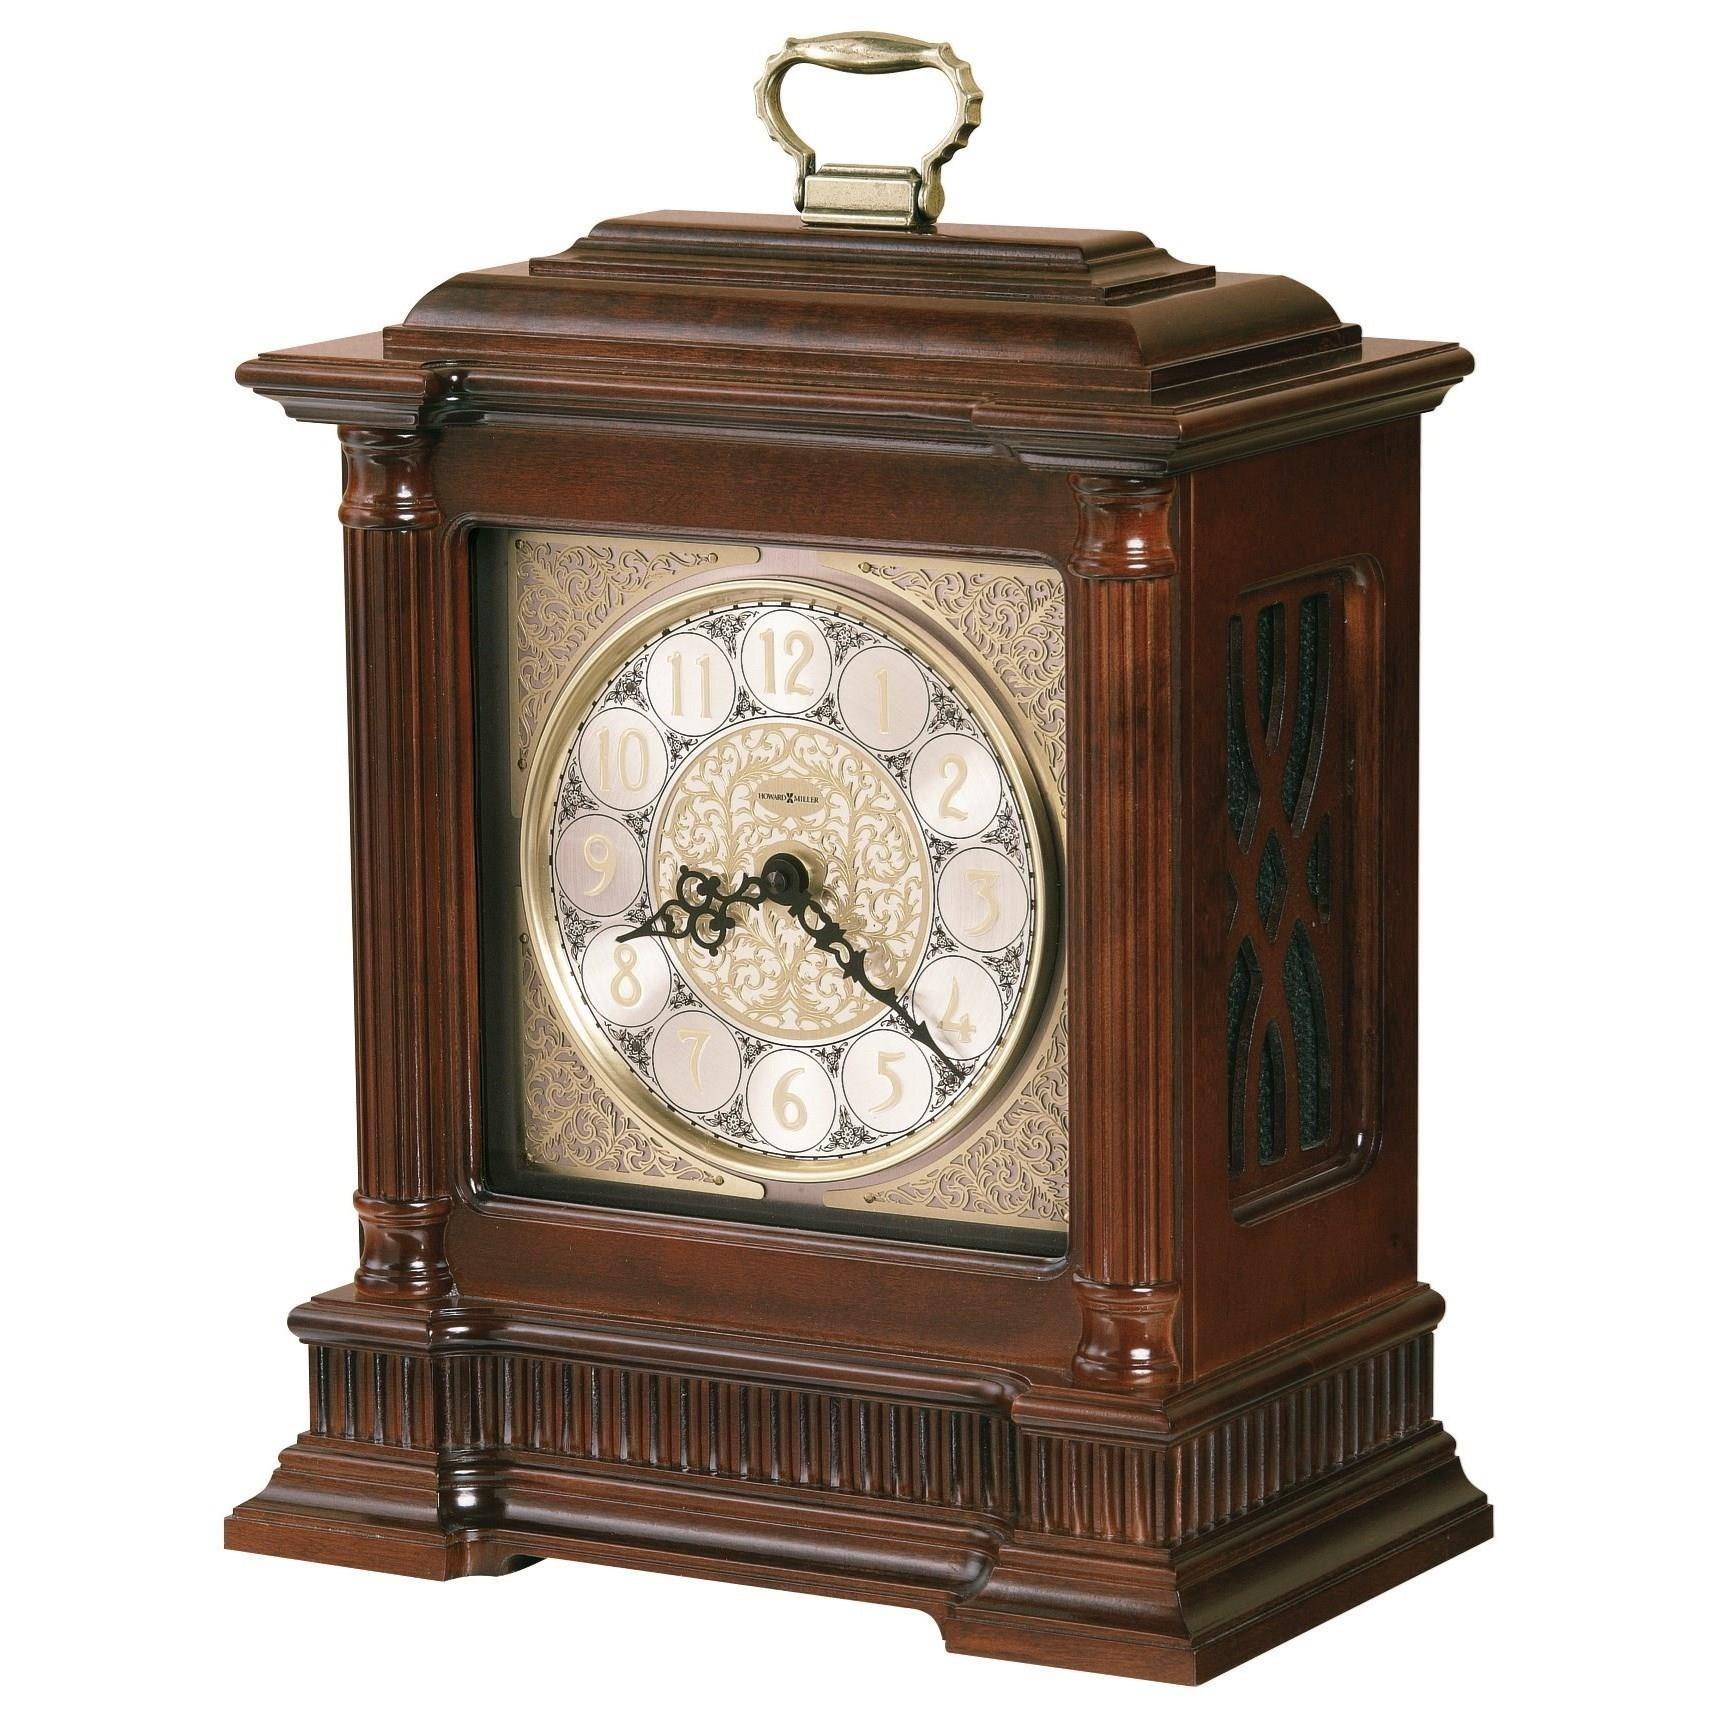 Howard Miller Table U0026 Mantel ClocksAkron Mantel Clock